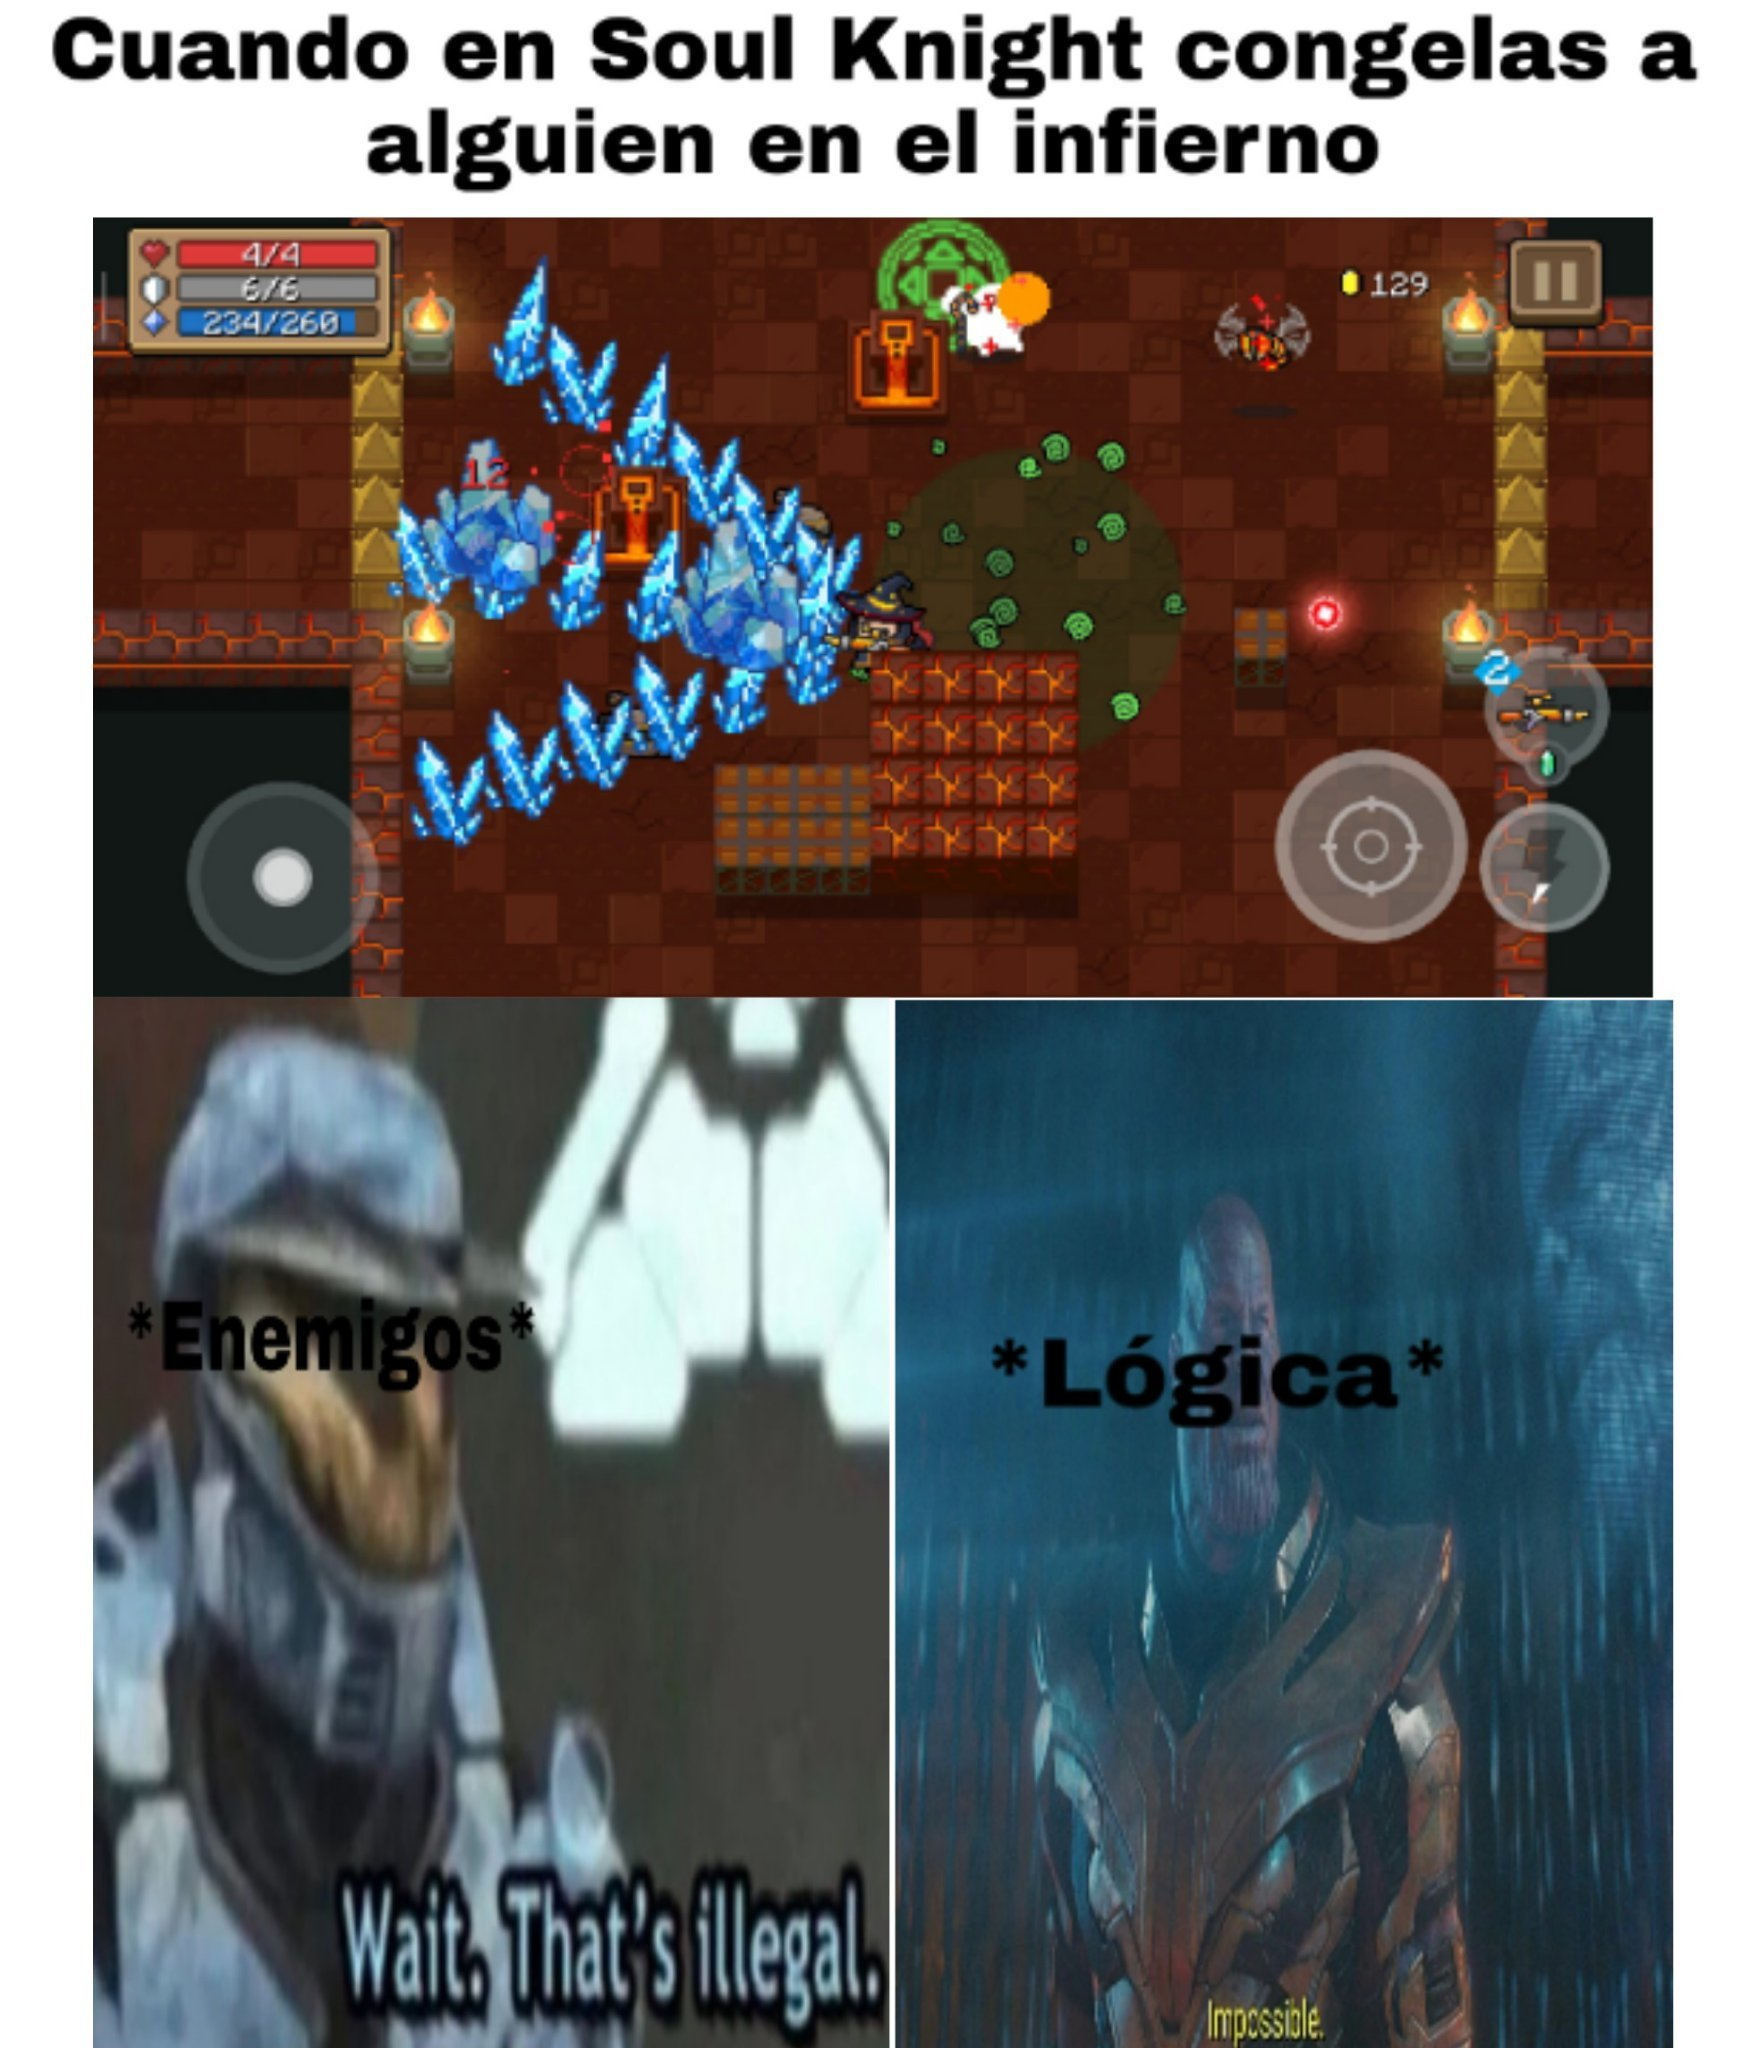 Me flipa el Soul Knight - meme